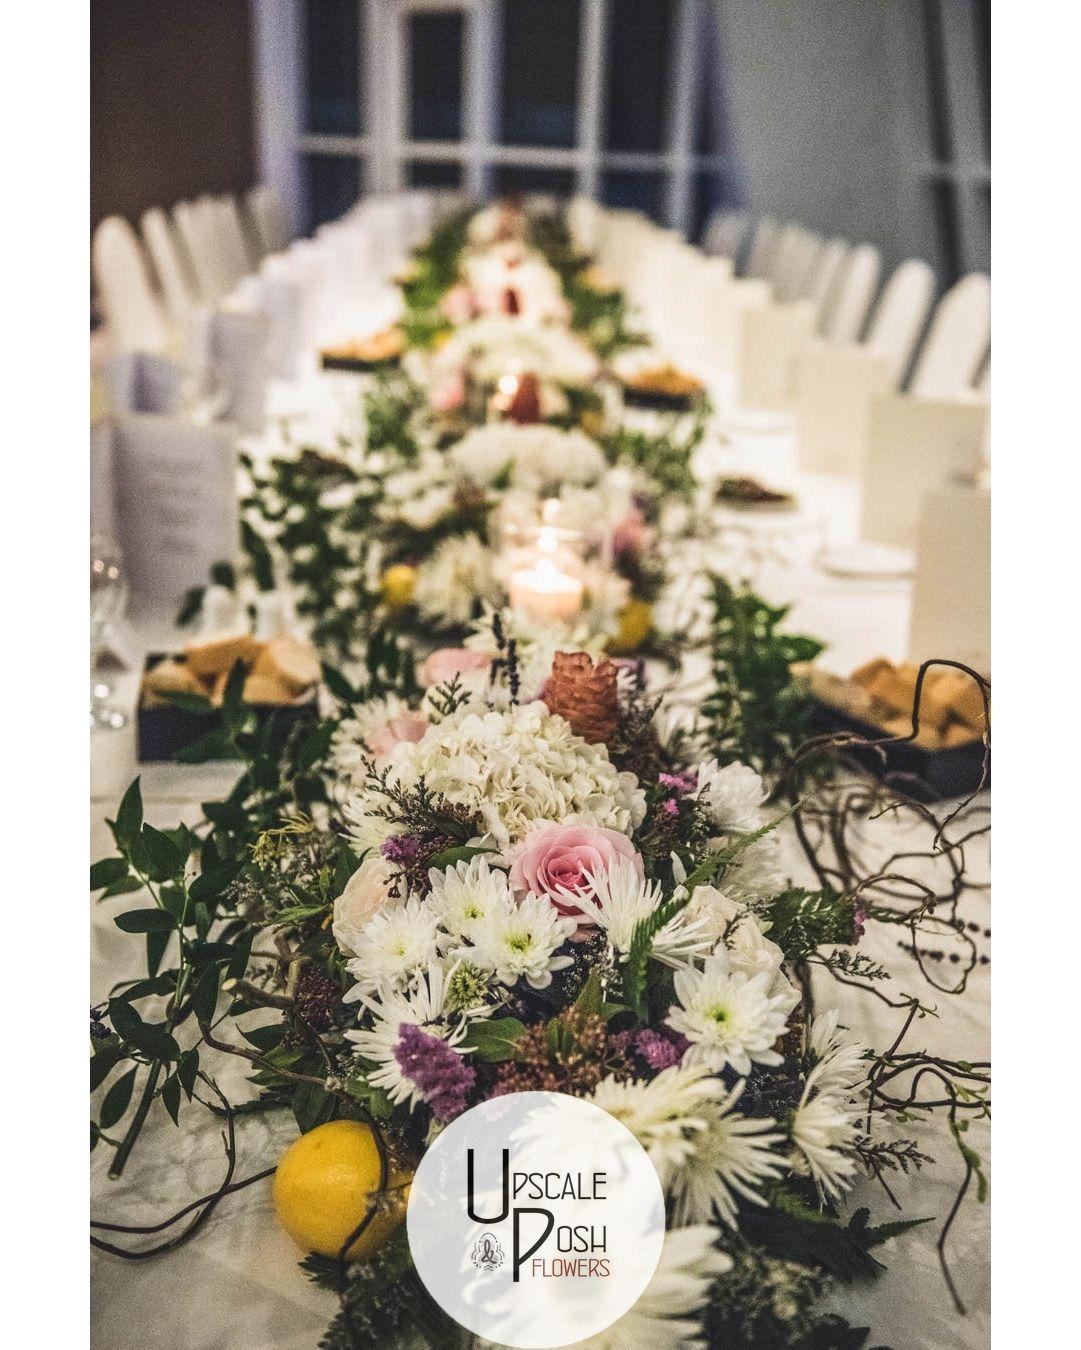 Pin On Upscale And Posh Flowers Dubai